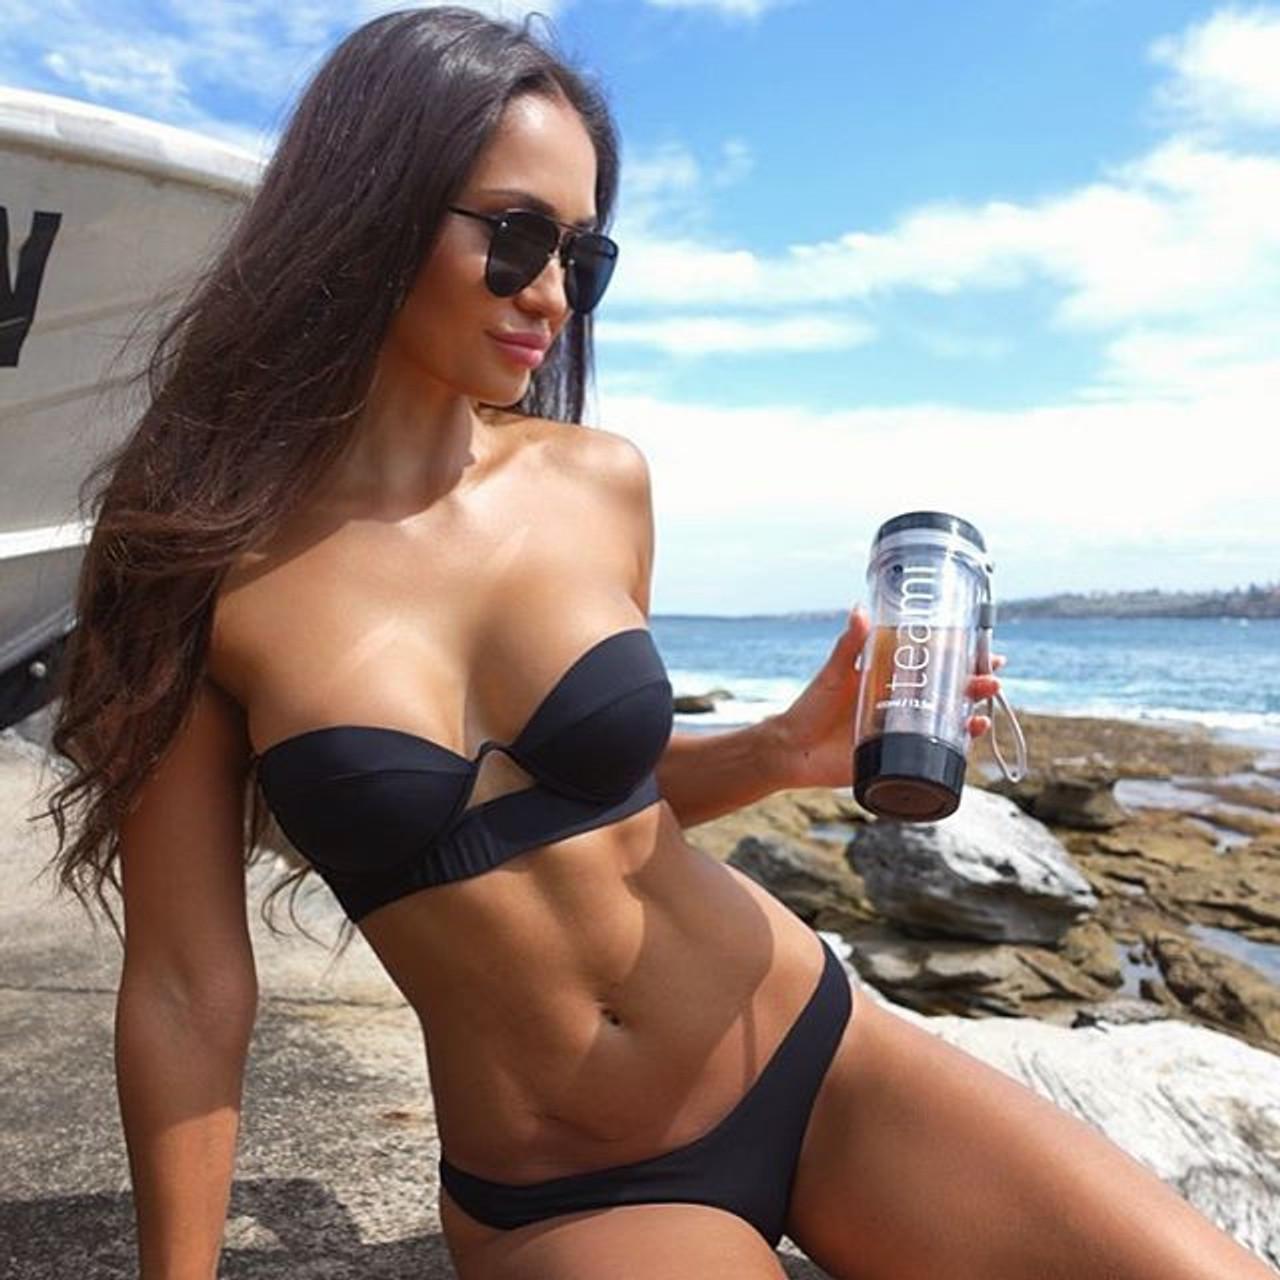 6a44be43d40 Strapless black bikinis 2018 sexy push up swimwear swimsuit women ...